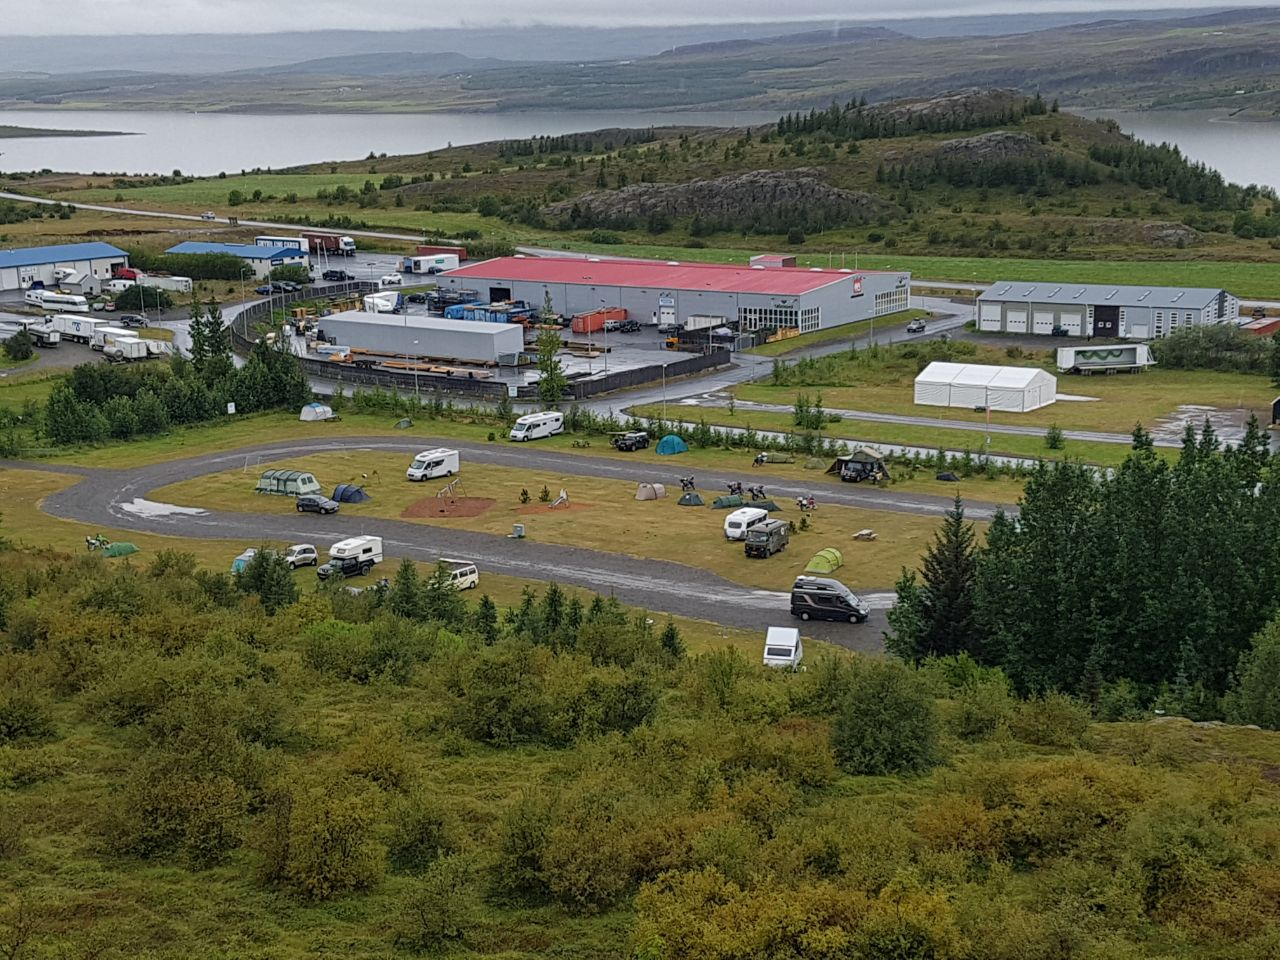 Blick auf unser letztes Lager in Island